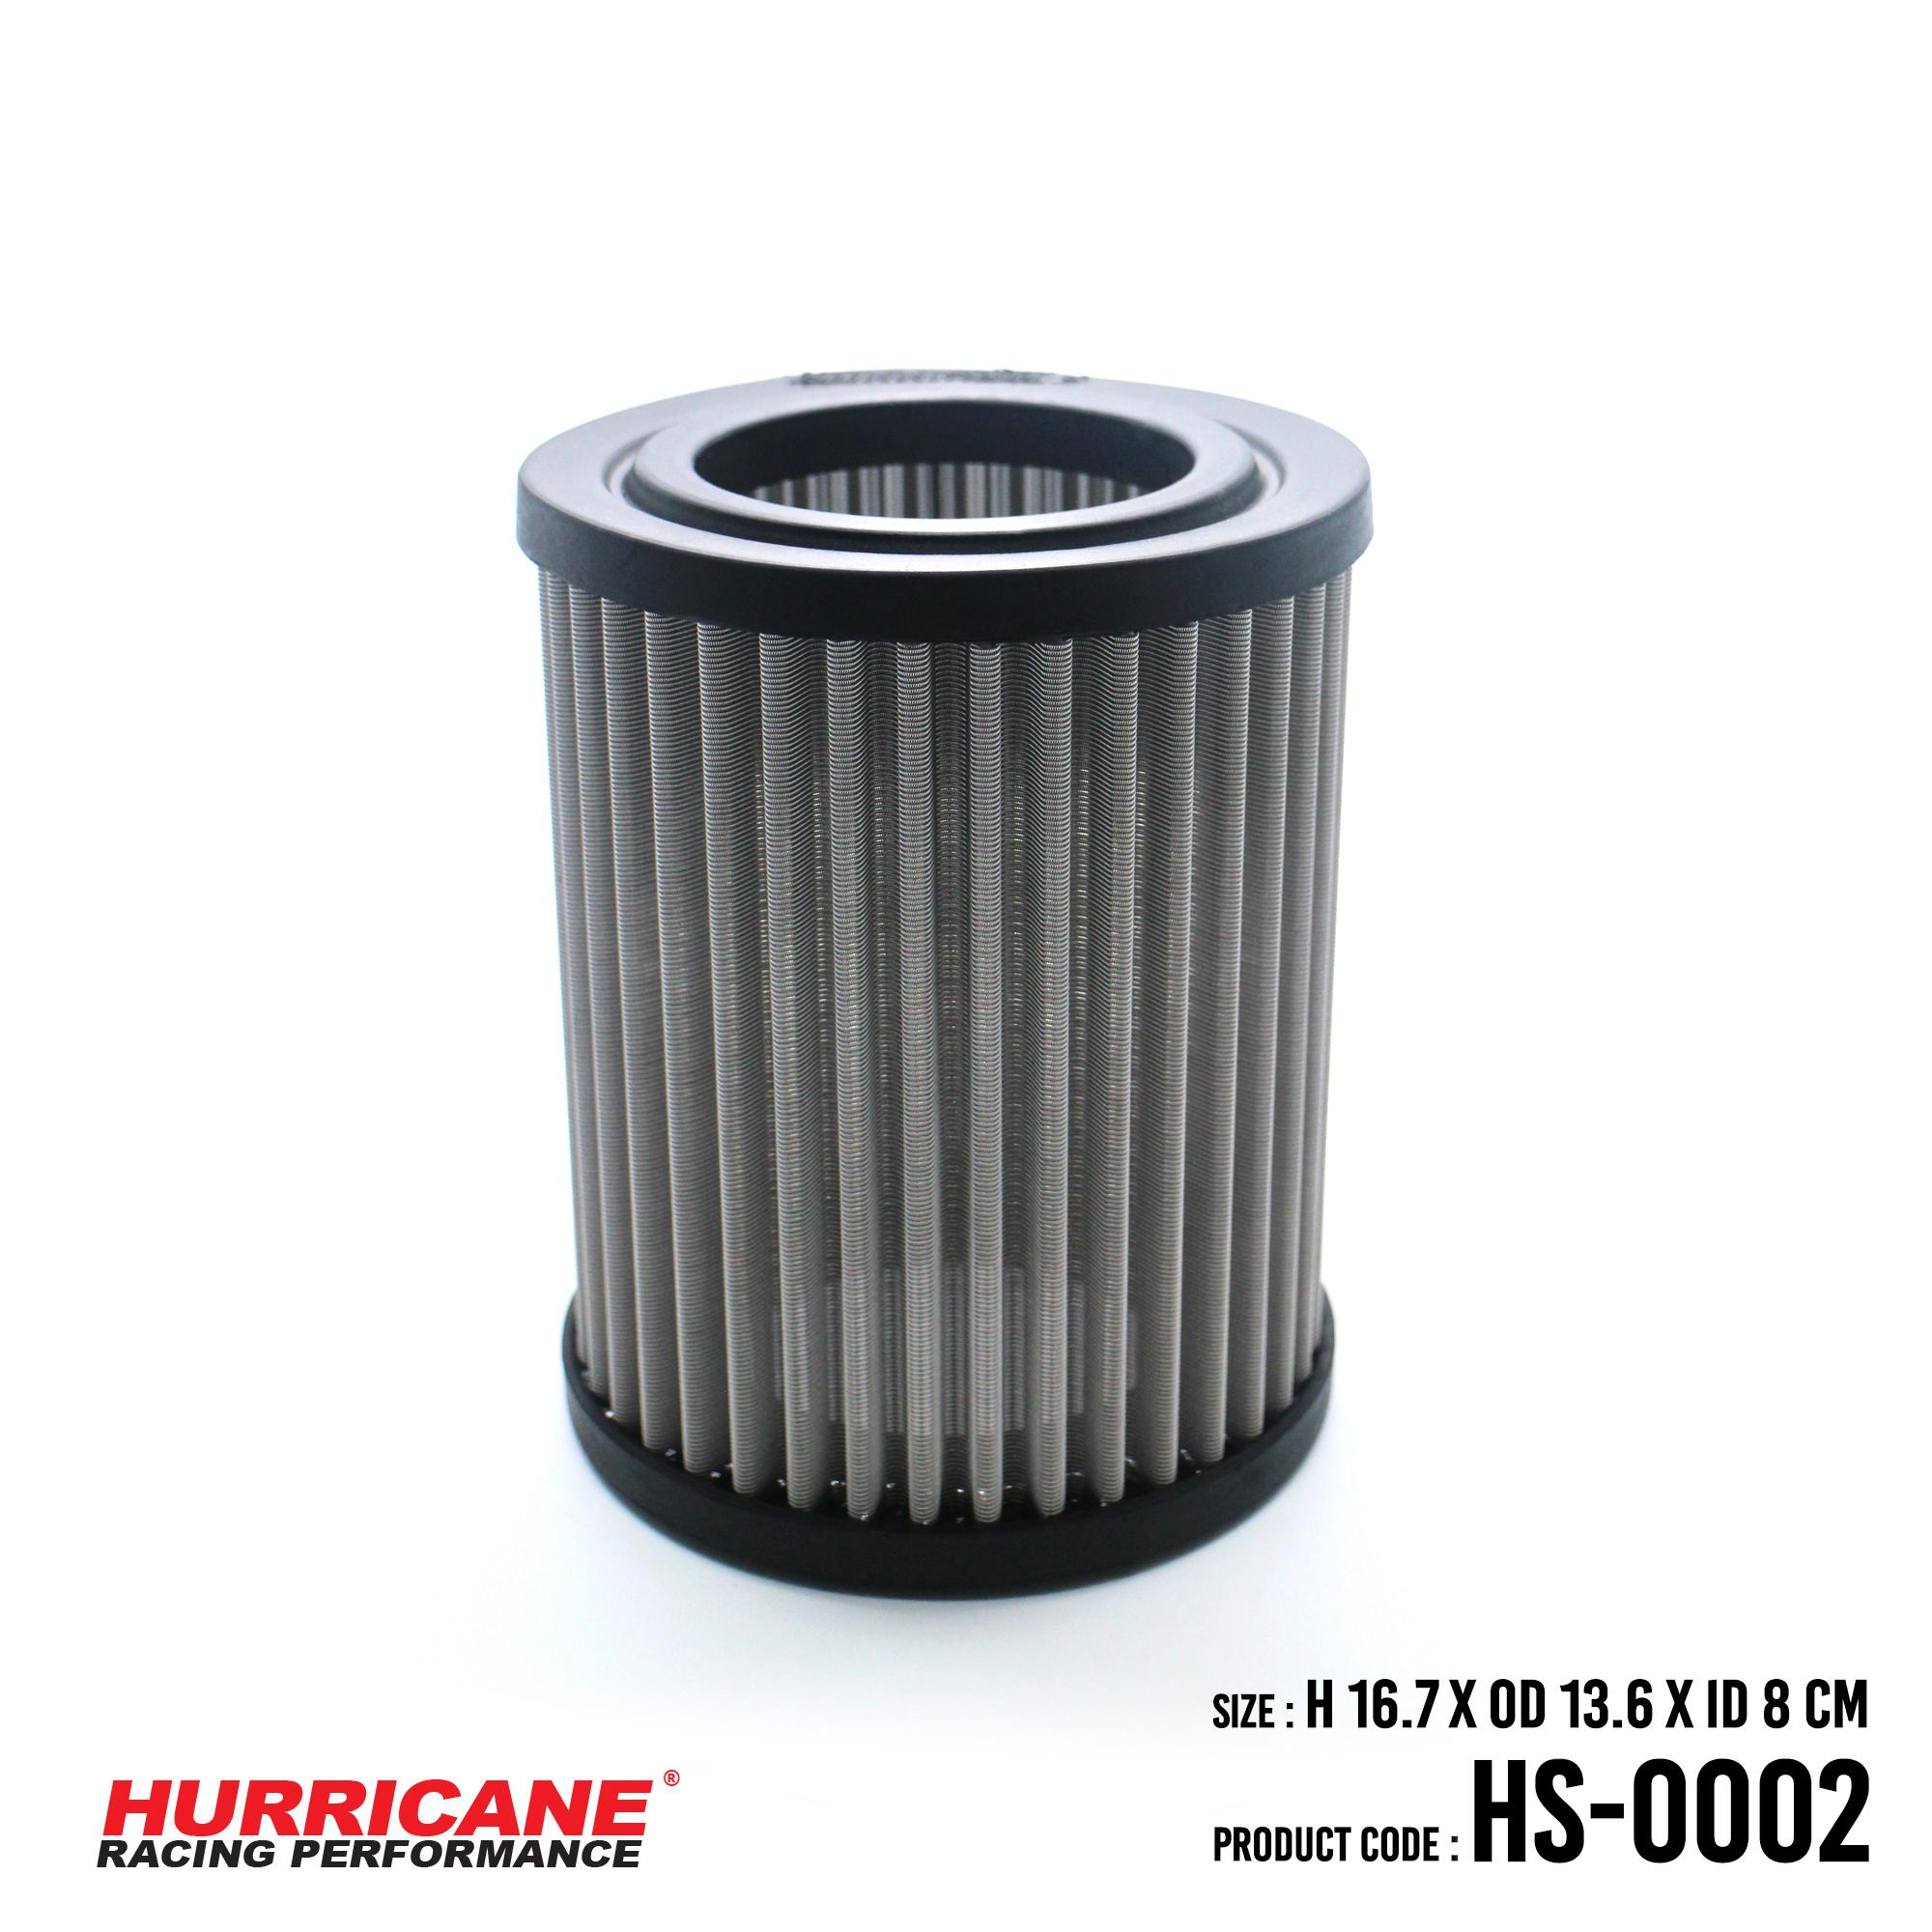 HURRICANE STAINLESS STEEL AIR FILTER FOR HS-0002 AcuraAlfaHonda